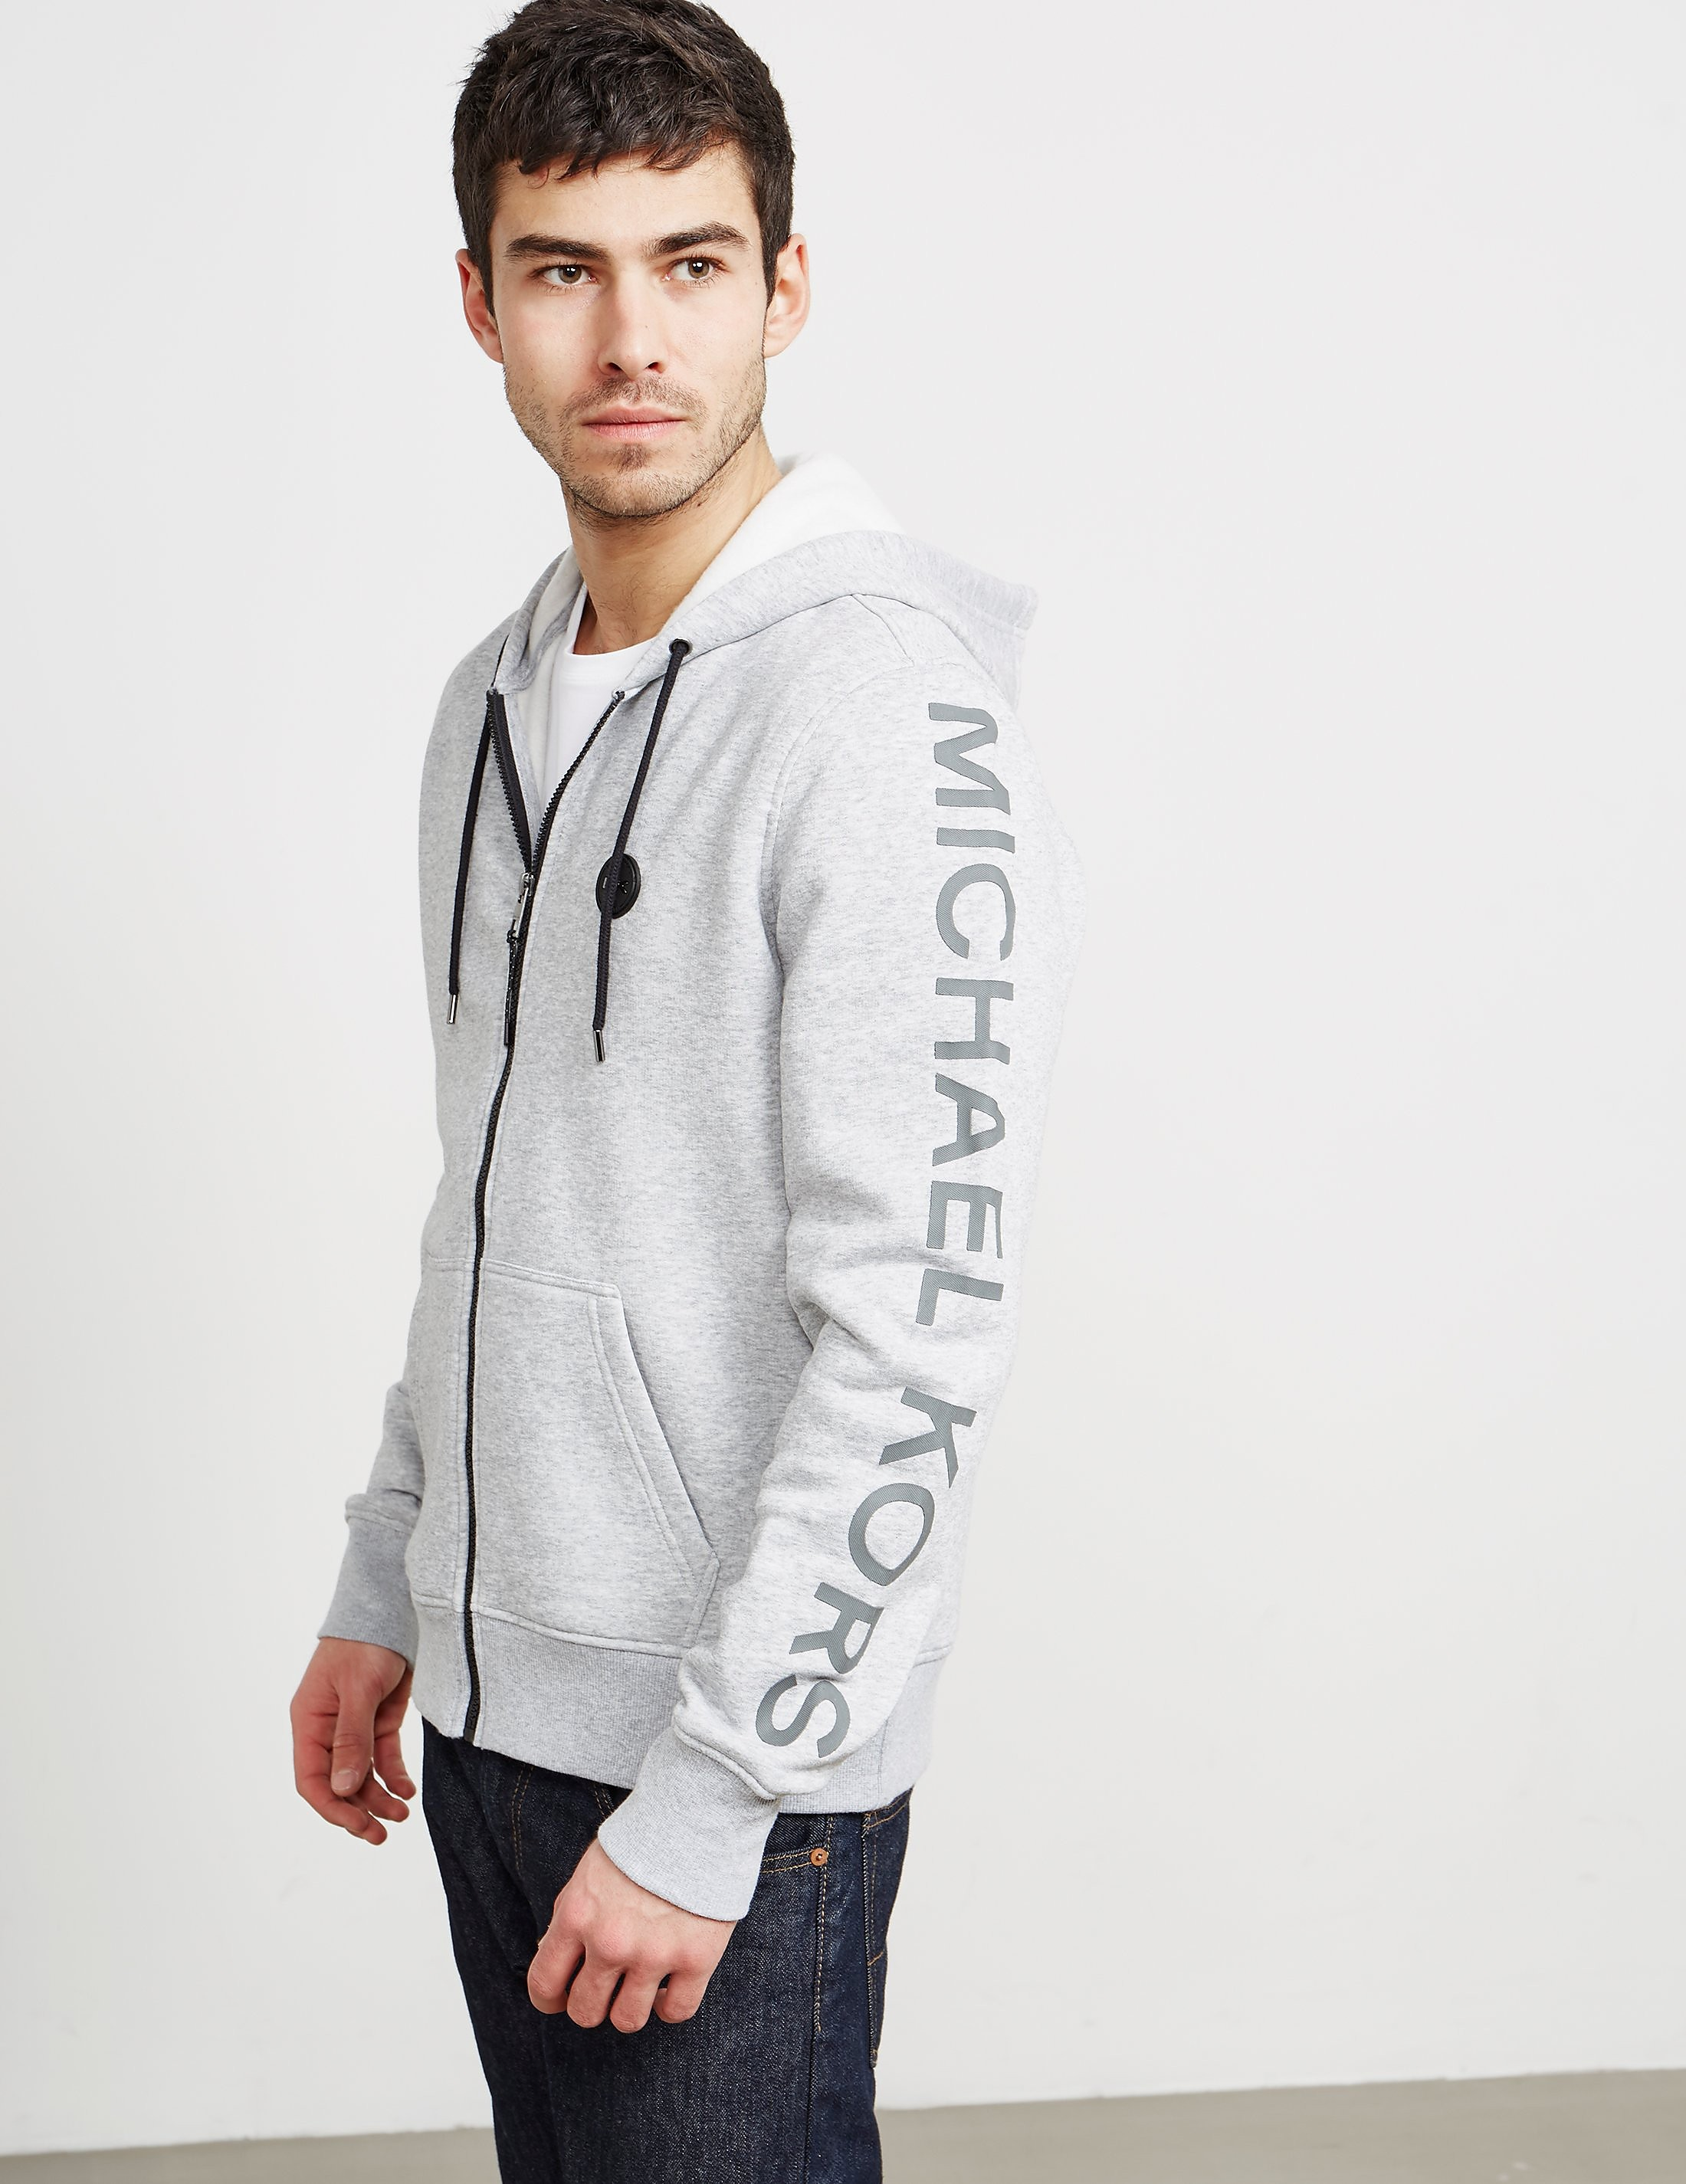 Michael Kors Arm Logo Full-Zip Hoody